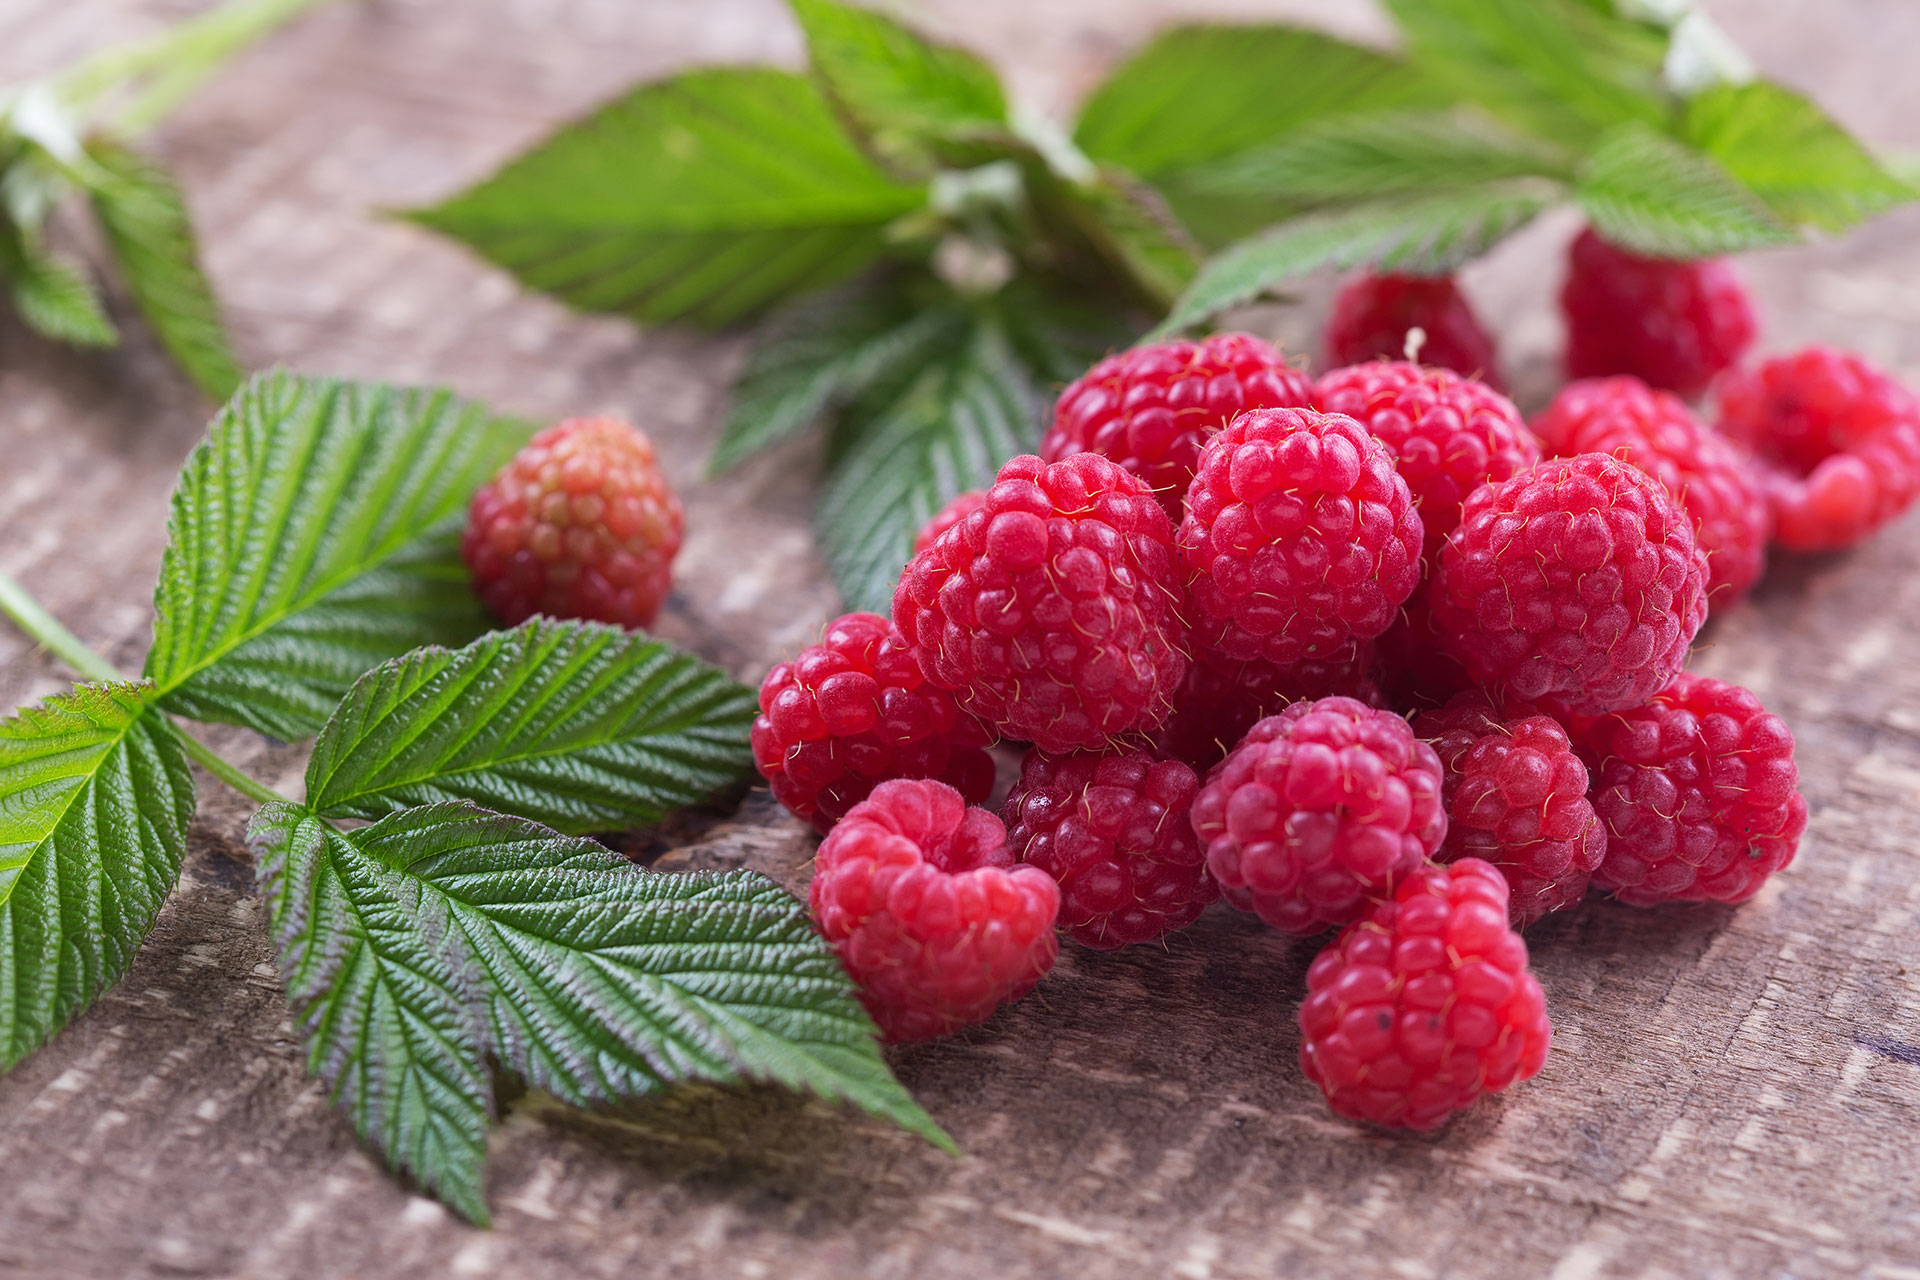 pick-your-own-raspberries-01